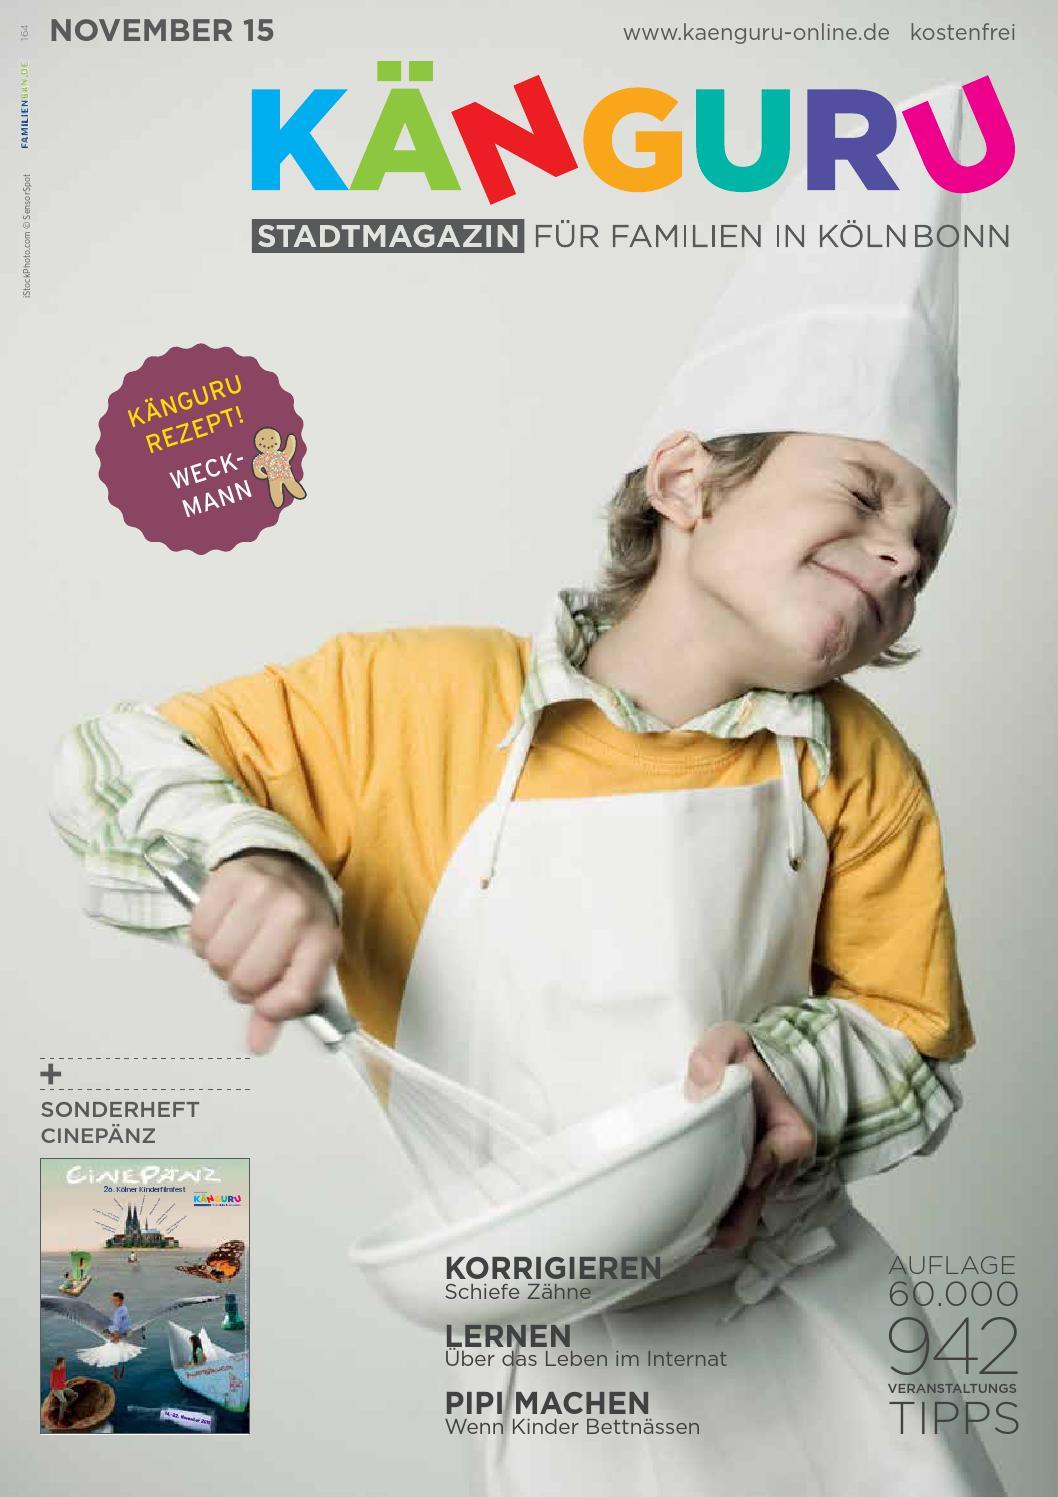 KÄNGURU Stadtmagazin für Familien in Köln Bonn November 2015 by ...